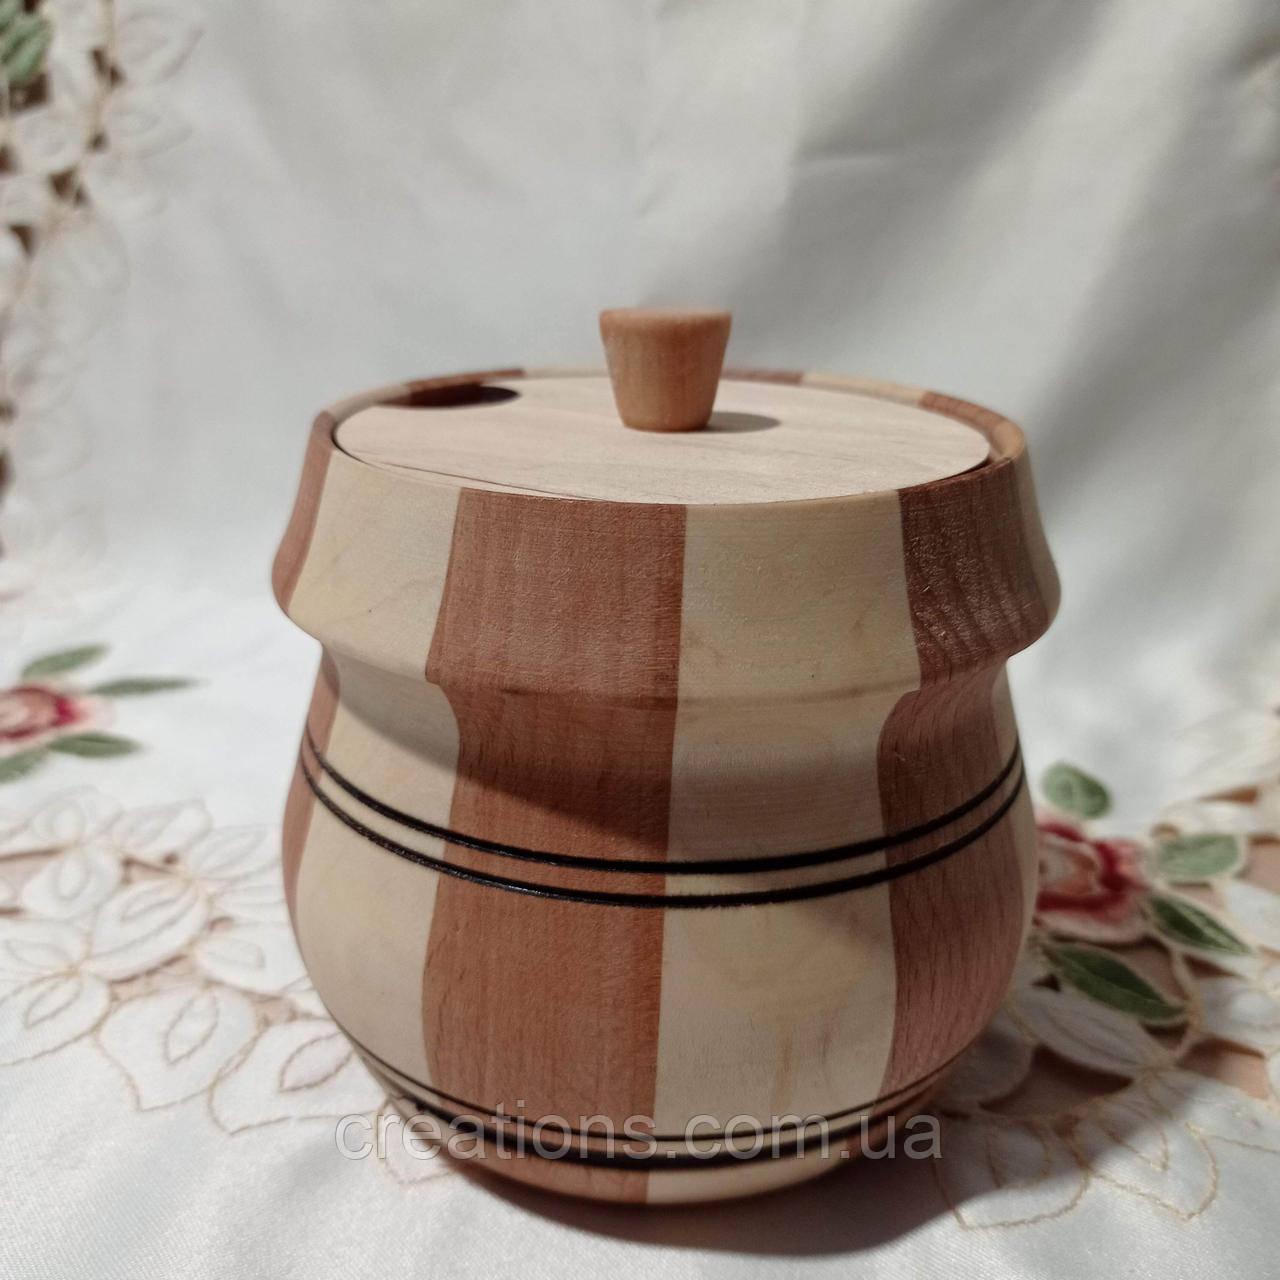 Деревянный бочонок для меда, сахара, соли, специй 11х11 см. 400 мл. Б-2